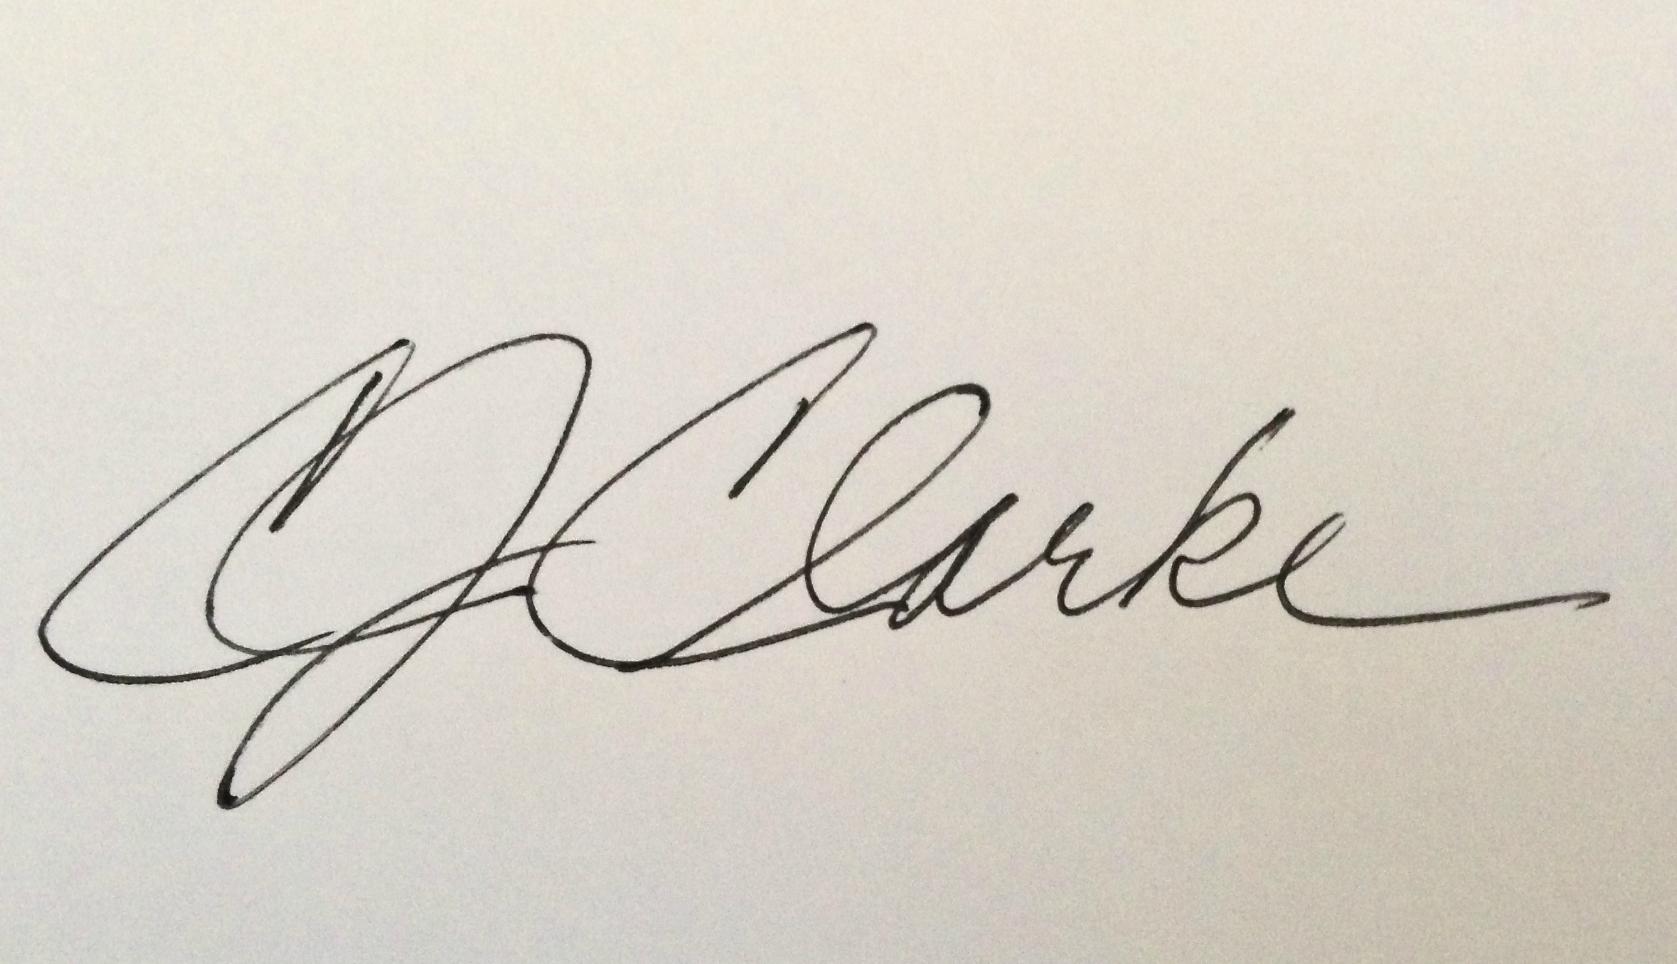 Cynde Clarke's Signature